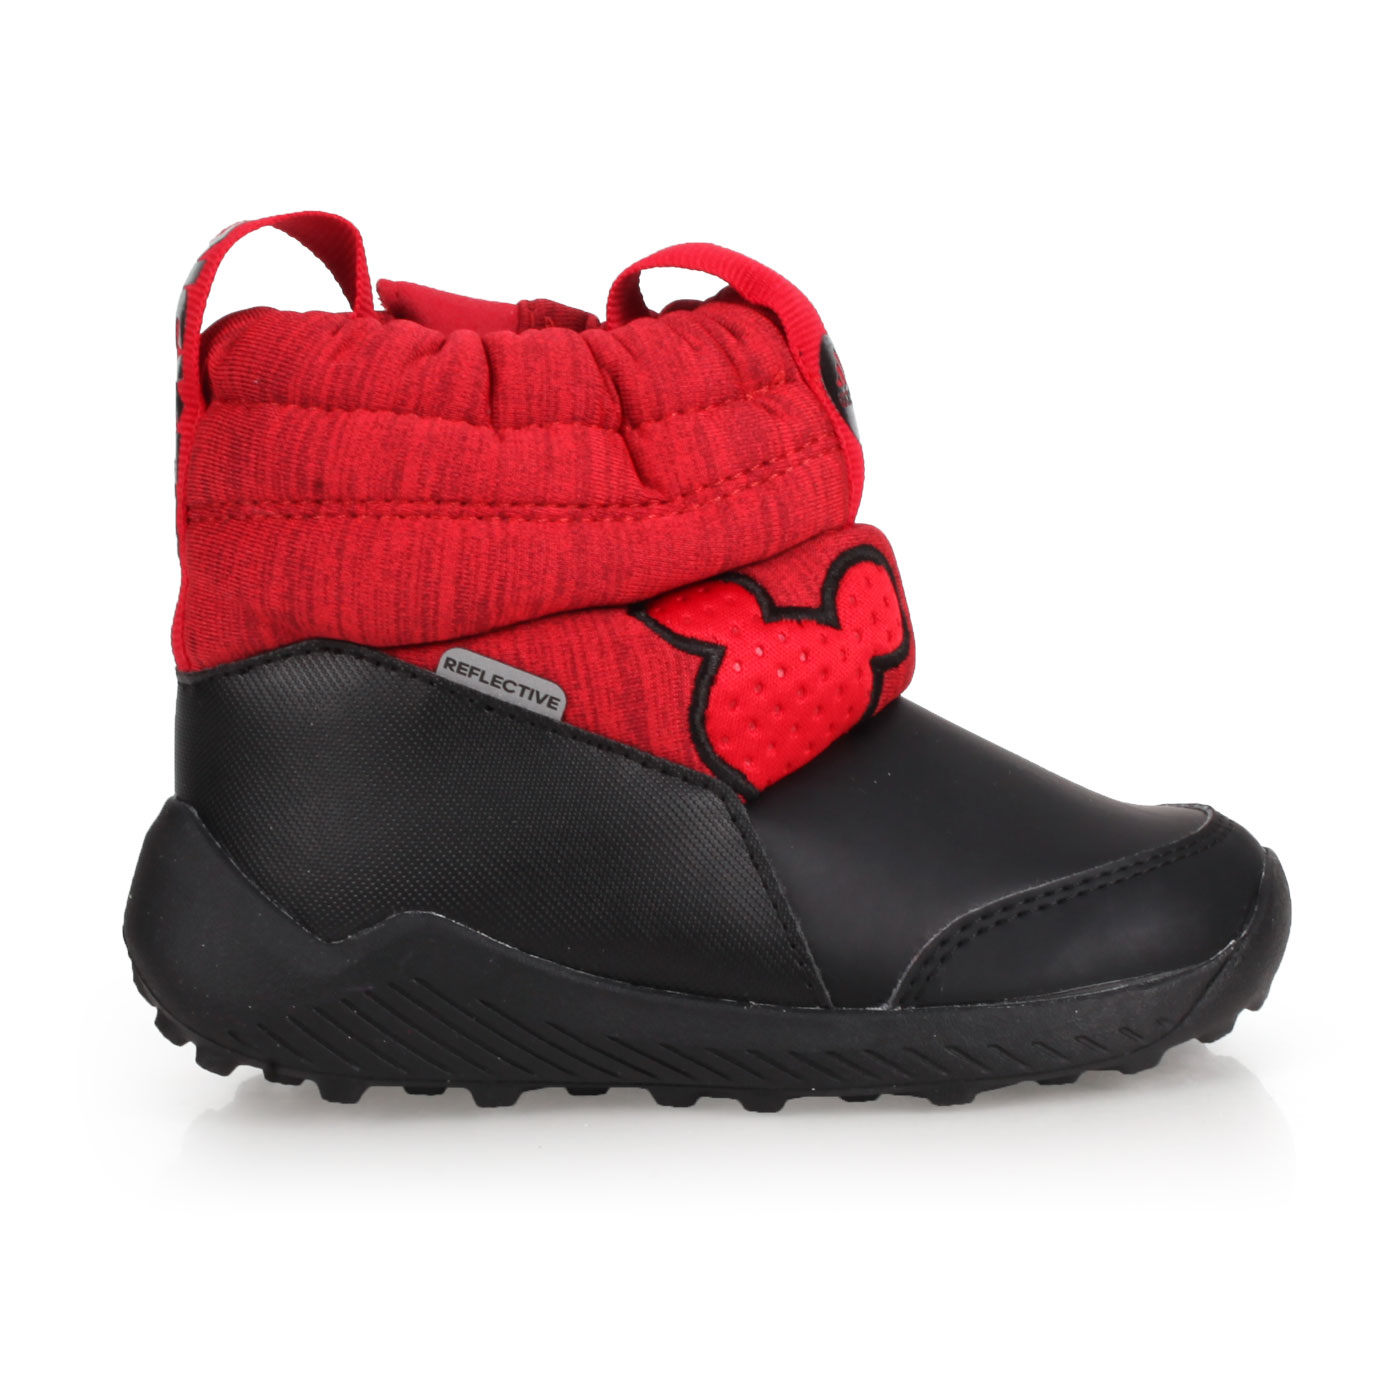 ADIDAS 小童保暖短筒靴  @RapidaSnow Mickey I@G27540